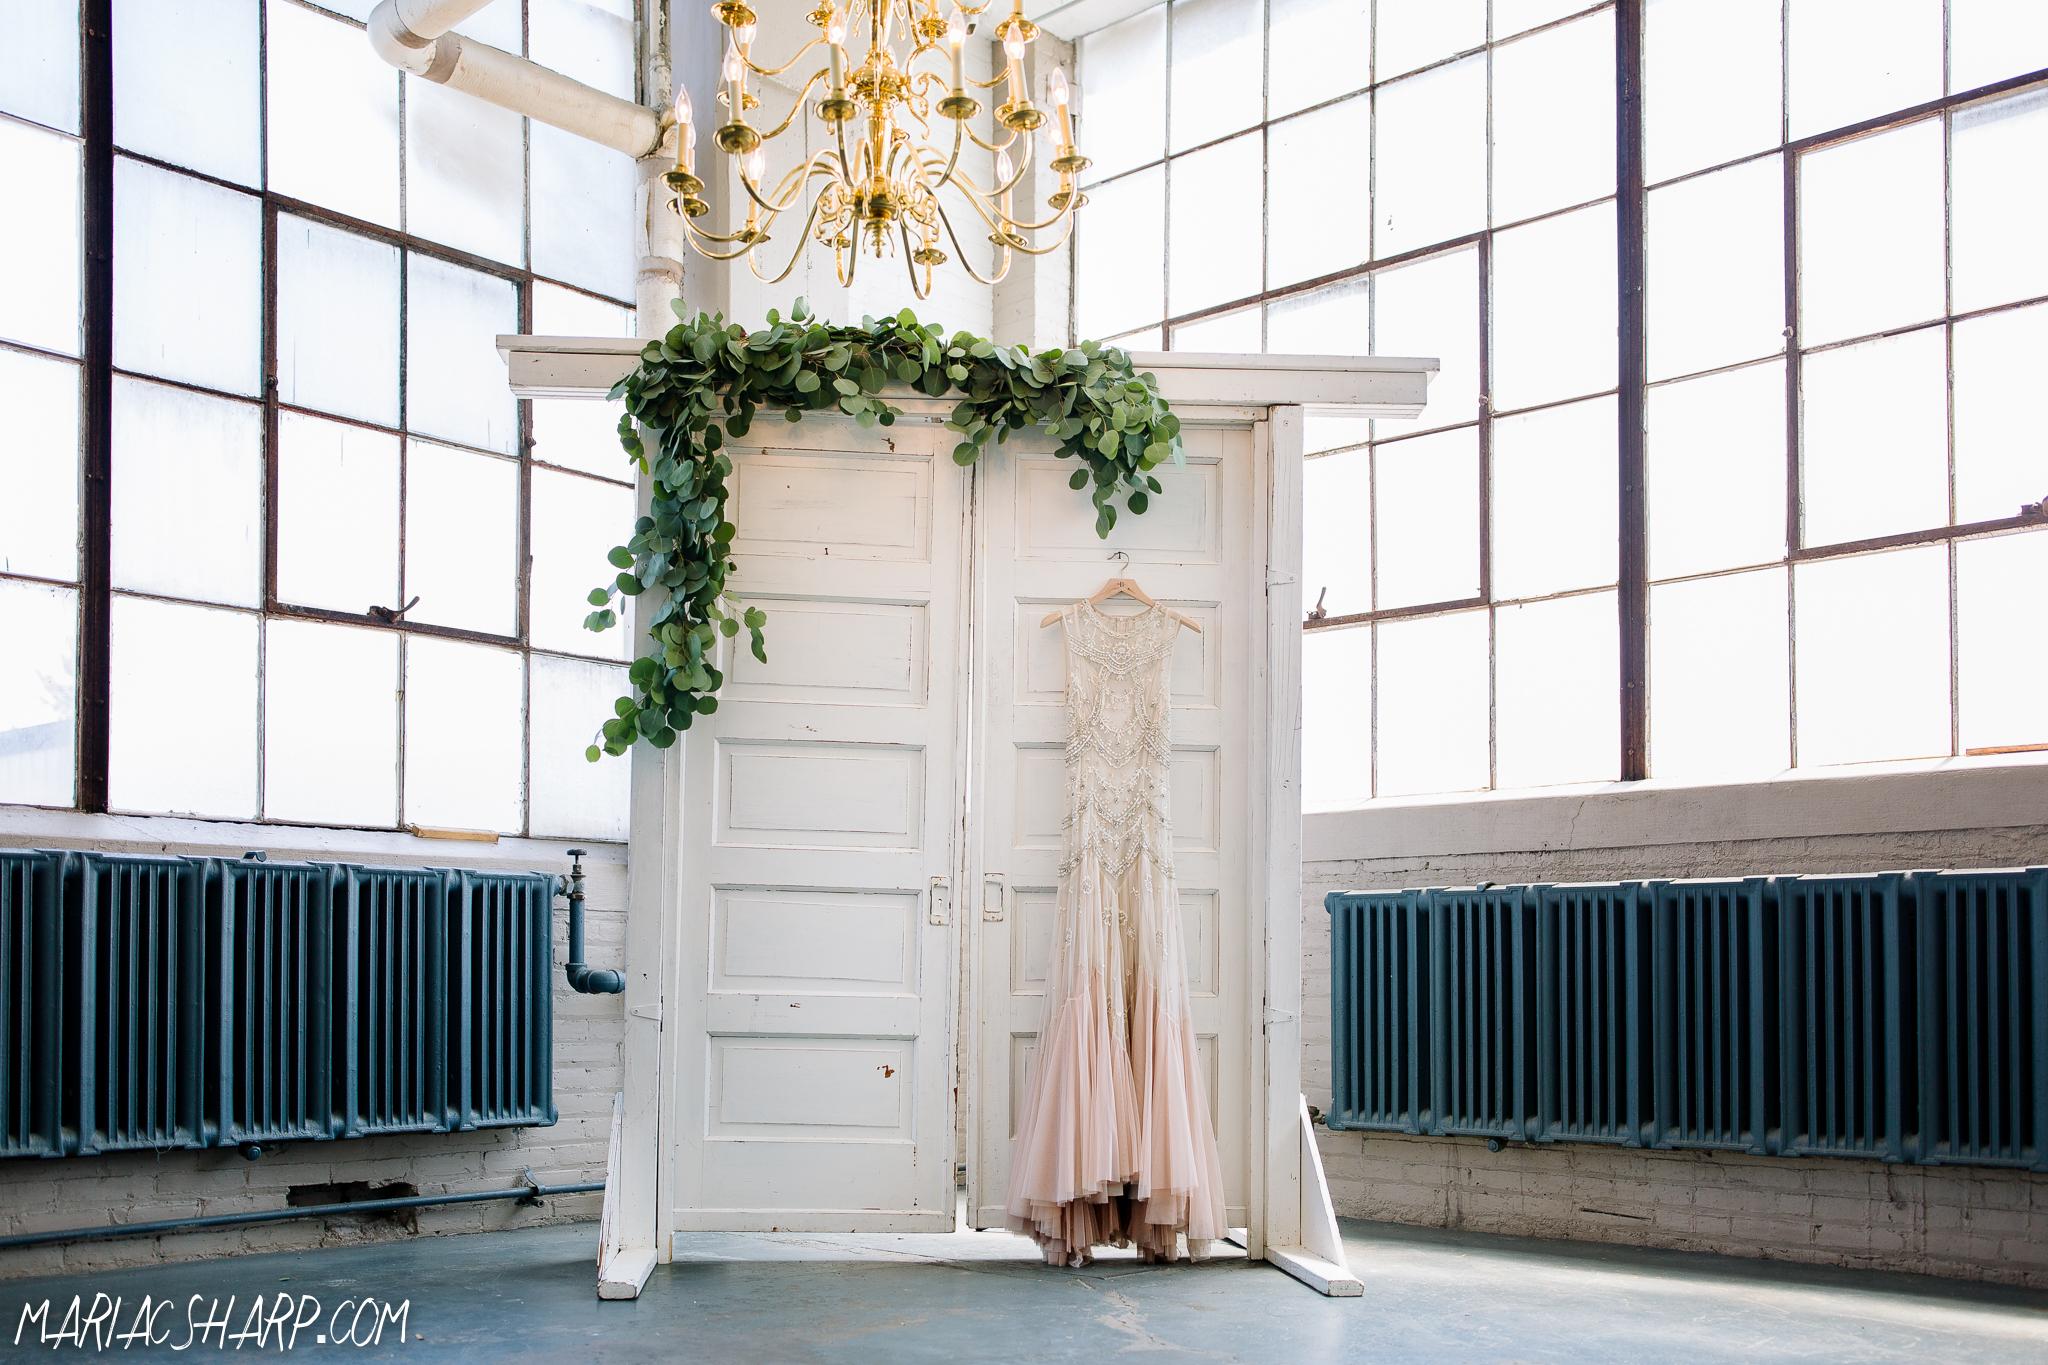 Cassie-Larson-Matt-Seccombe-wedding-20170715-001.jpg